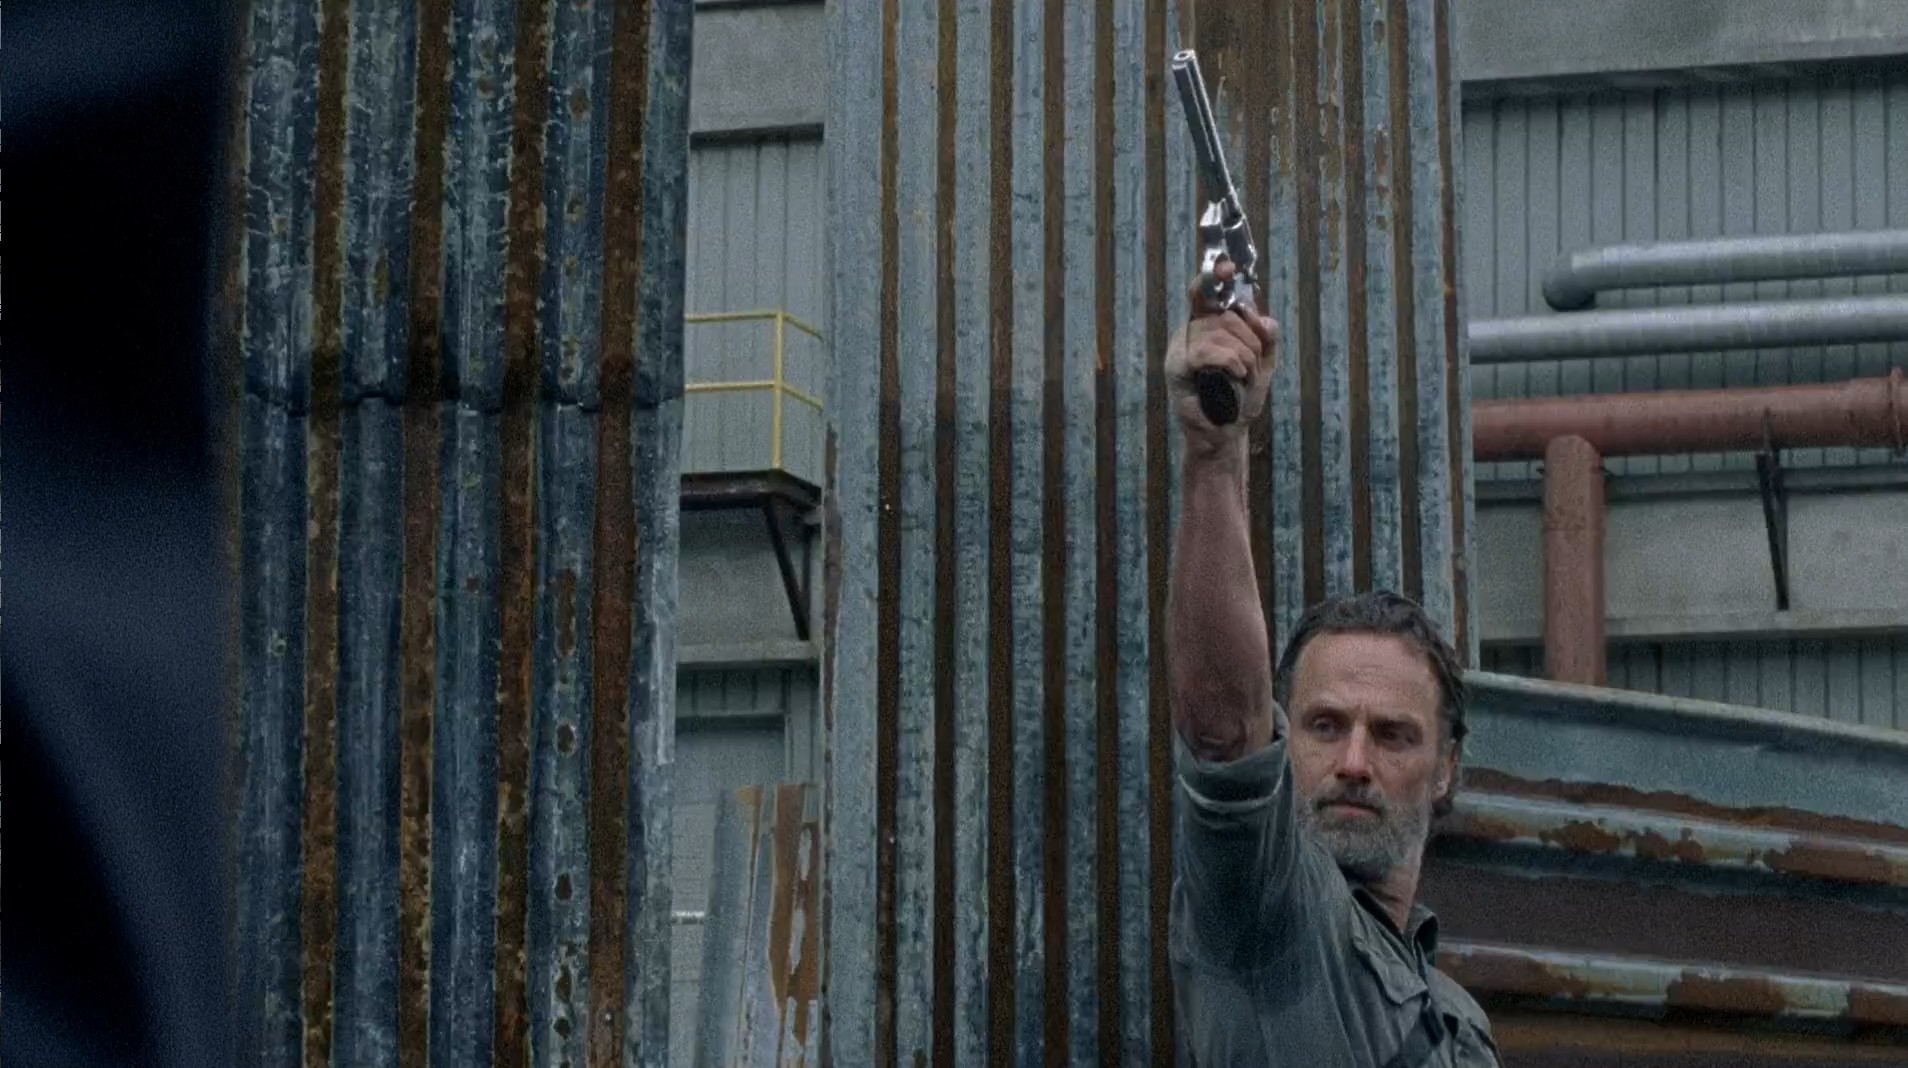 Ходячие мертвецы / The Walking Dead [08х01-04 из 16] (2017) WEB-DL 1080p | FOX